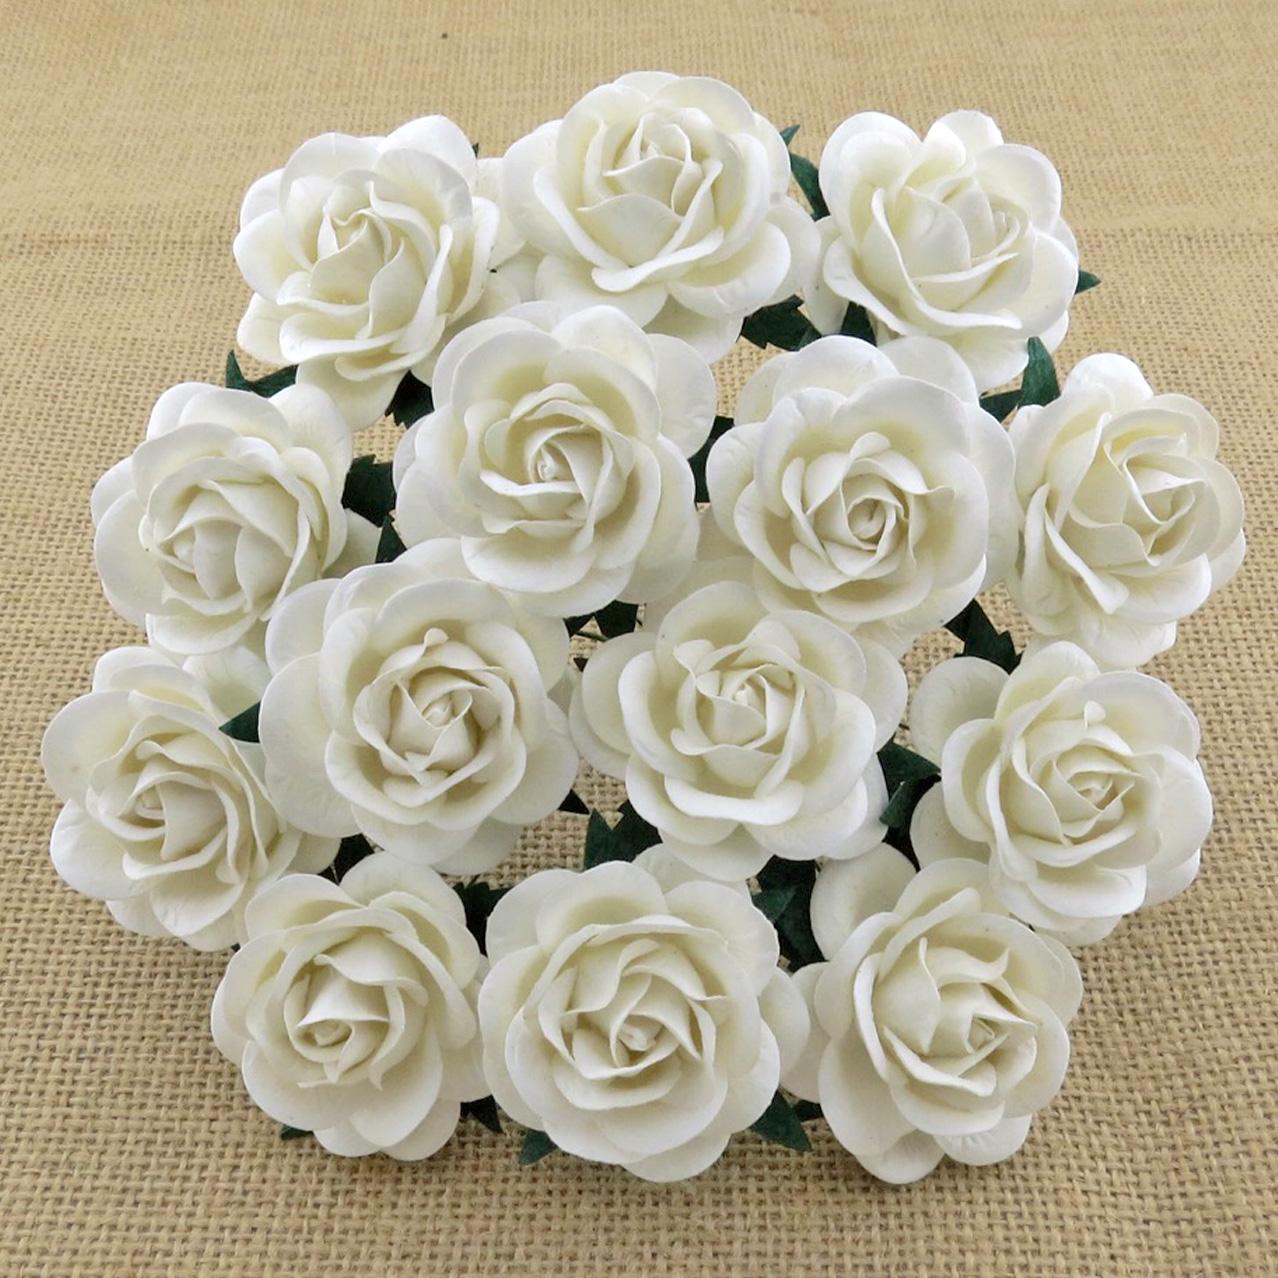 Mulberry Flowers - Trellis Rose 35mm - White